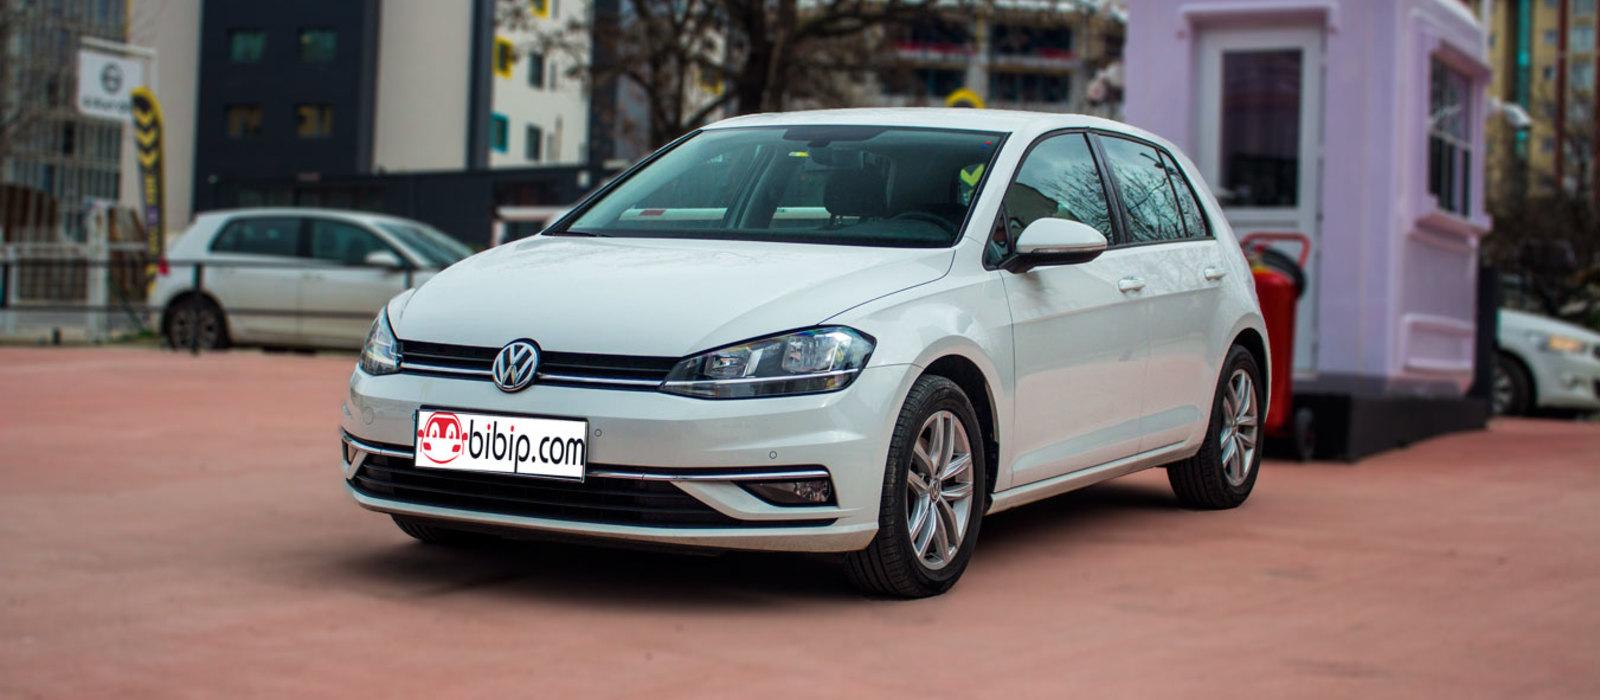 Satılık Ikinci El Volkswagen 16 Tdi Bluemotion Comfortline Golf 2